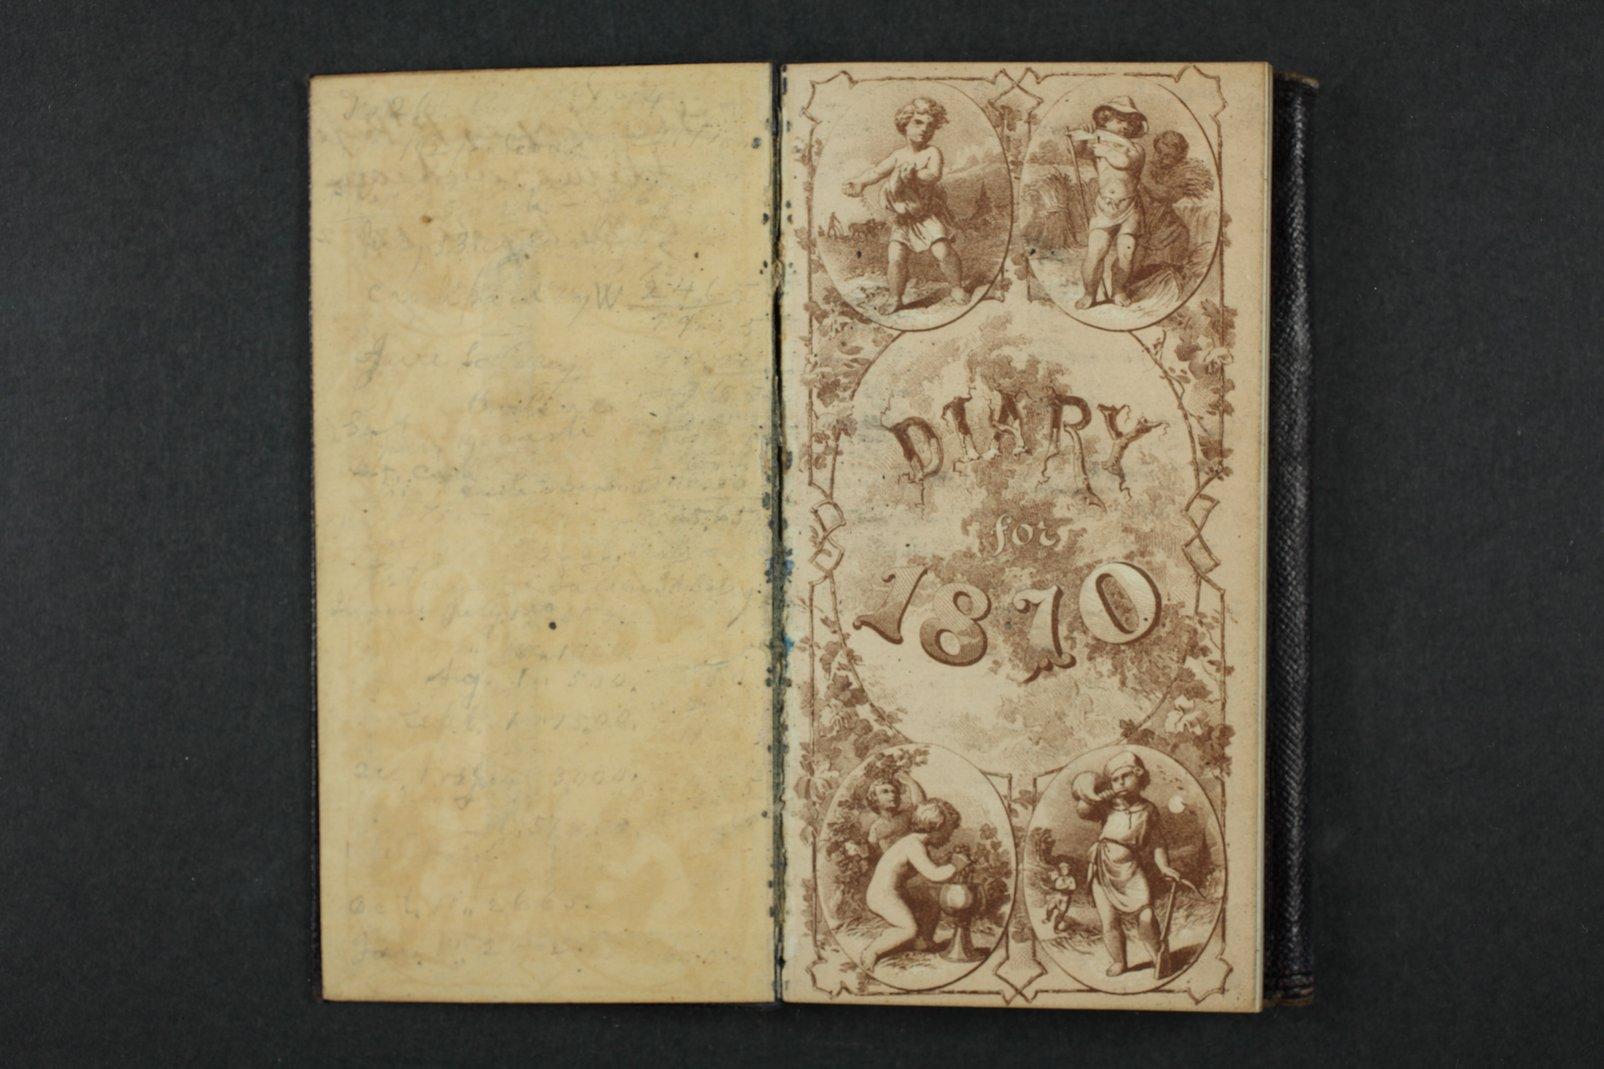 Isaac Tichenor Goodnow diary - 3